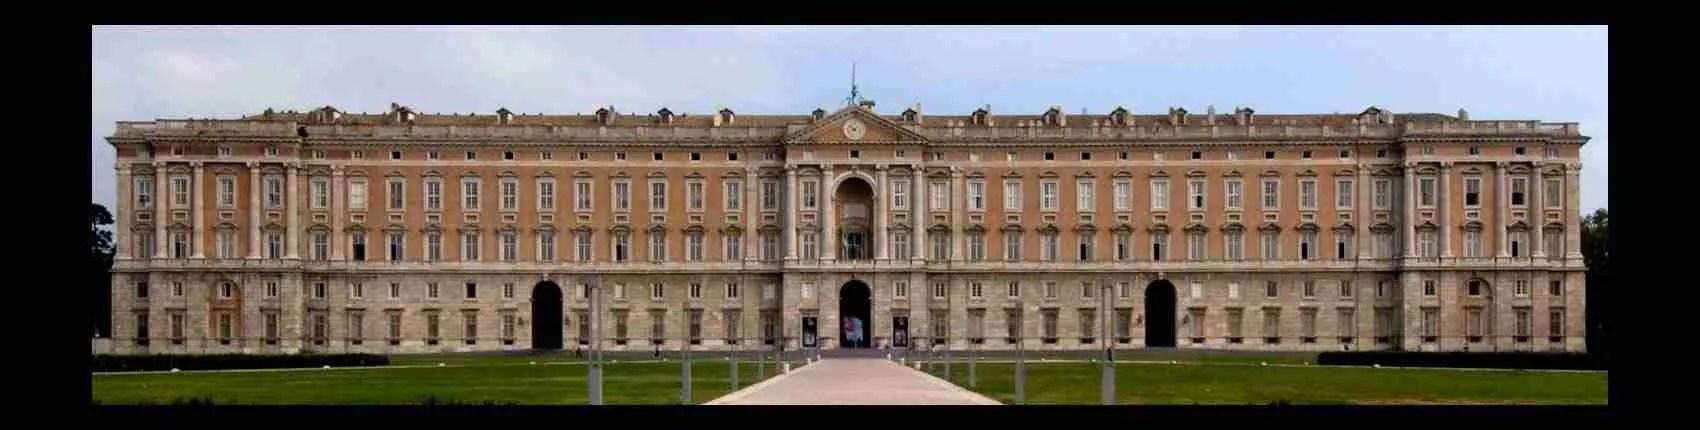 Una visita alla Reggia di Caserta in compagnia di una escort di Caserta è una tappa obbligata. Magica Escort